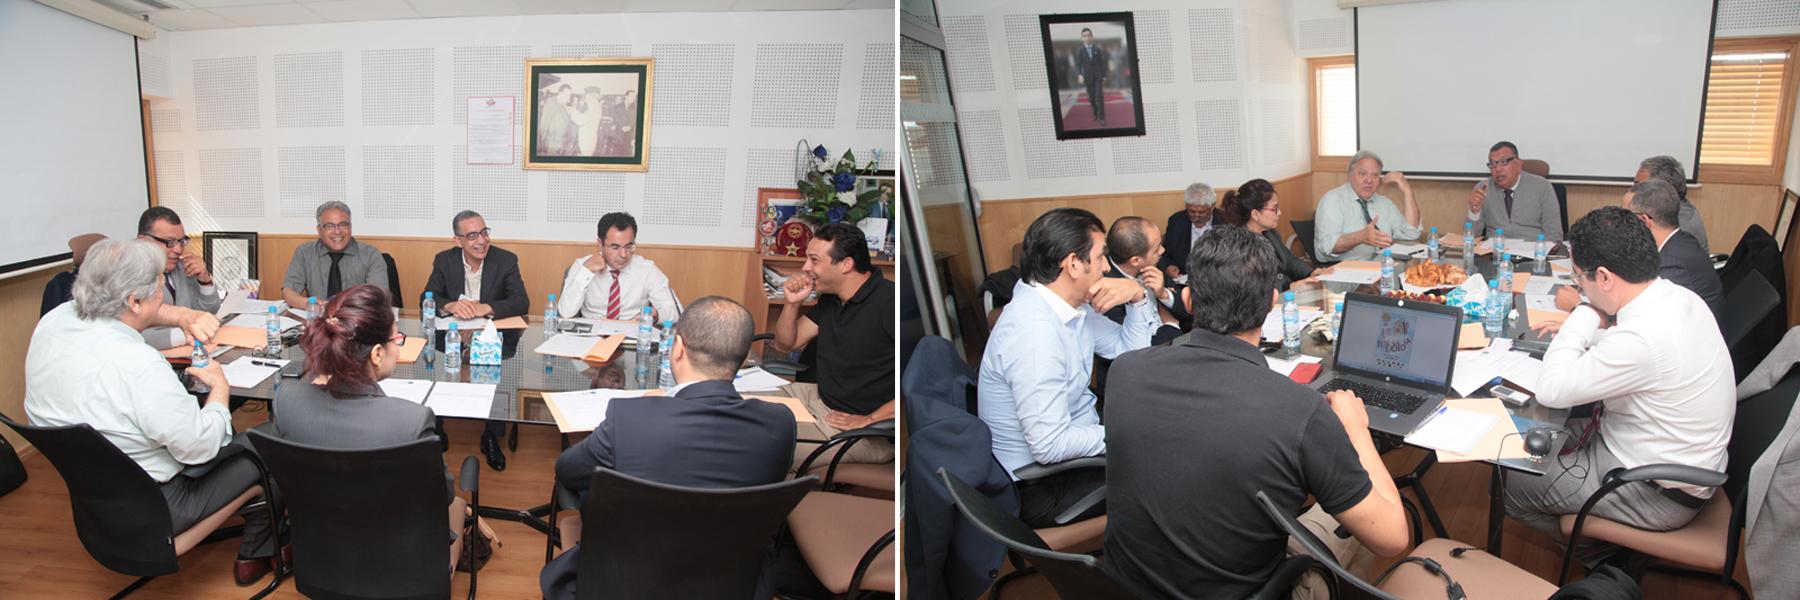 Photo réunion ARTI V2